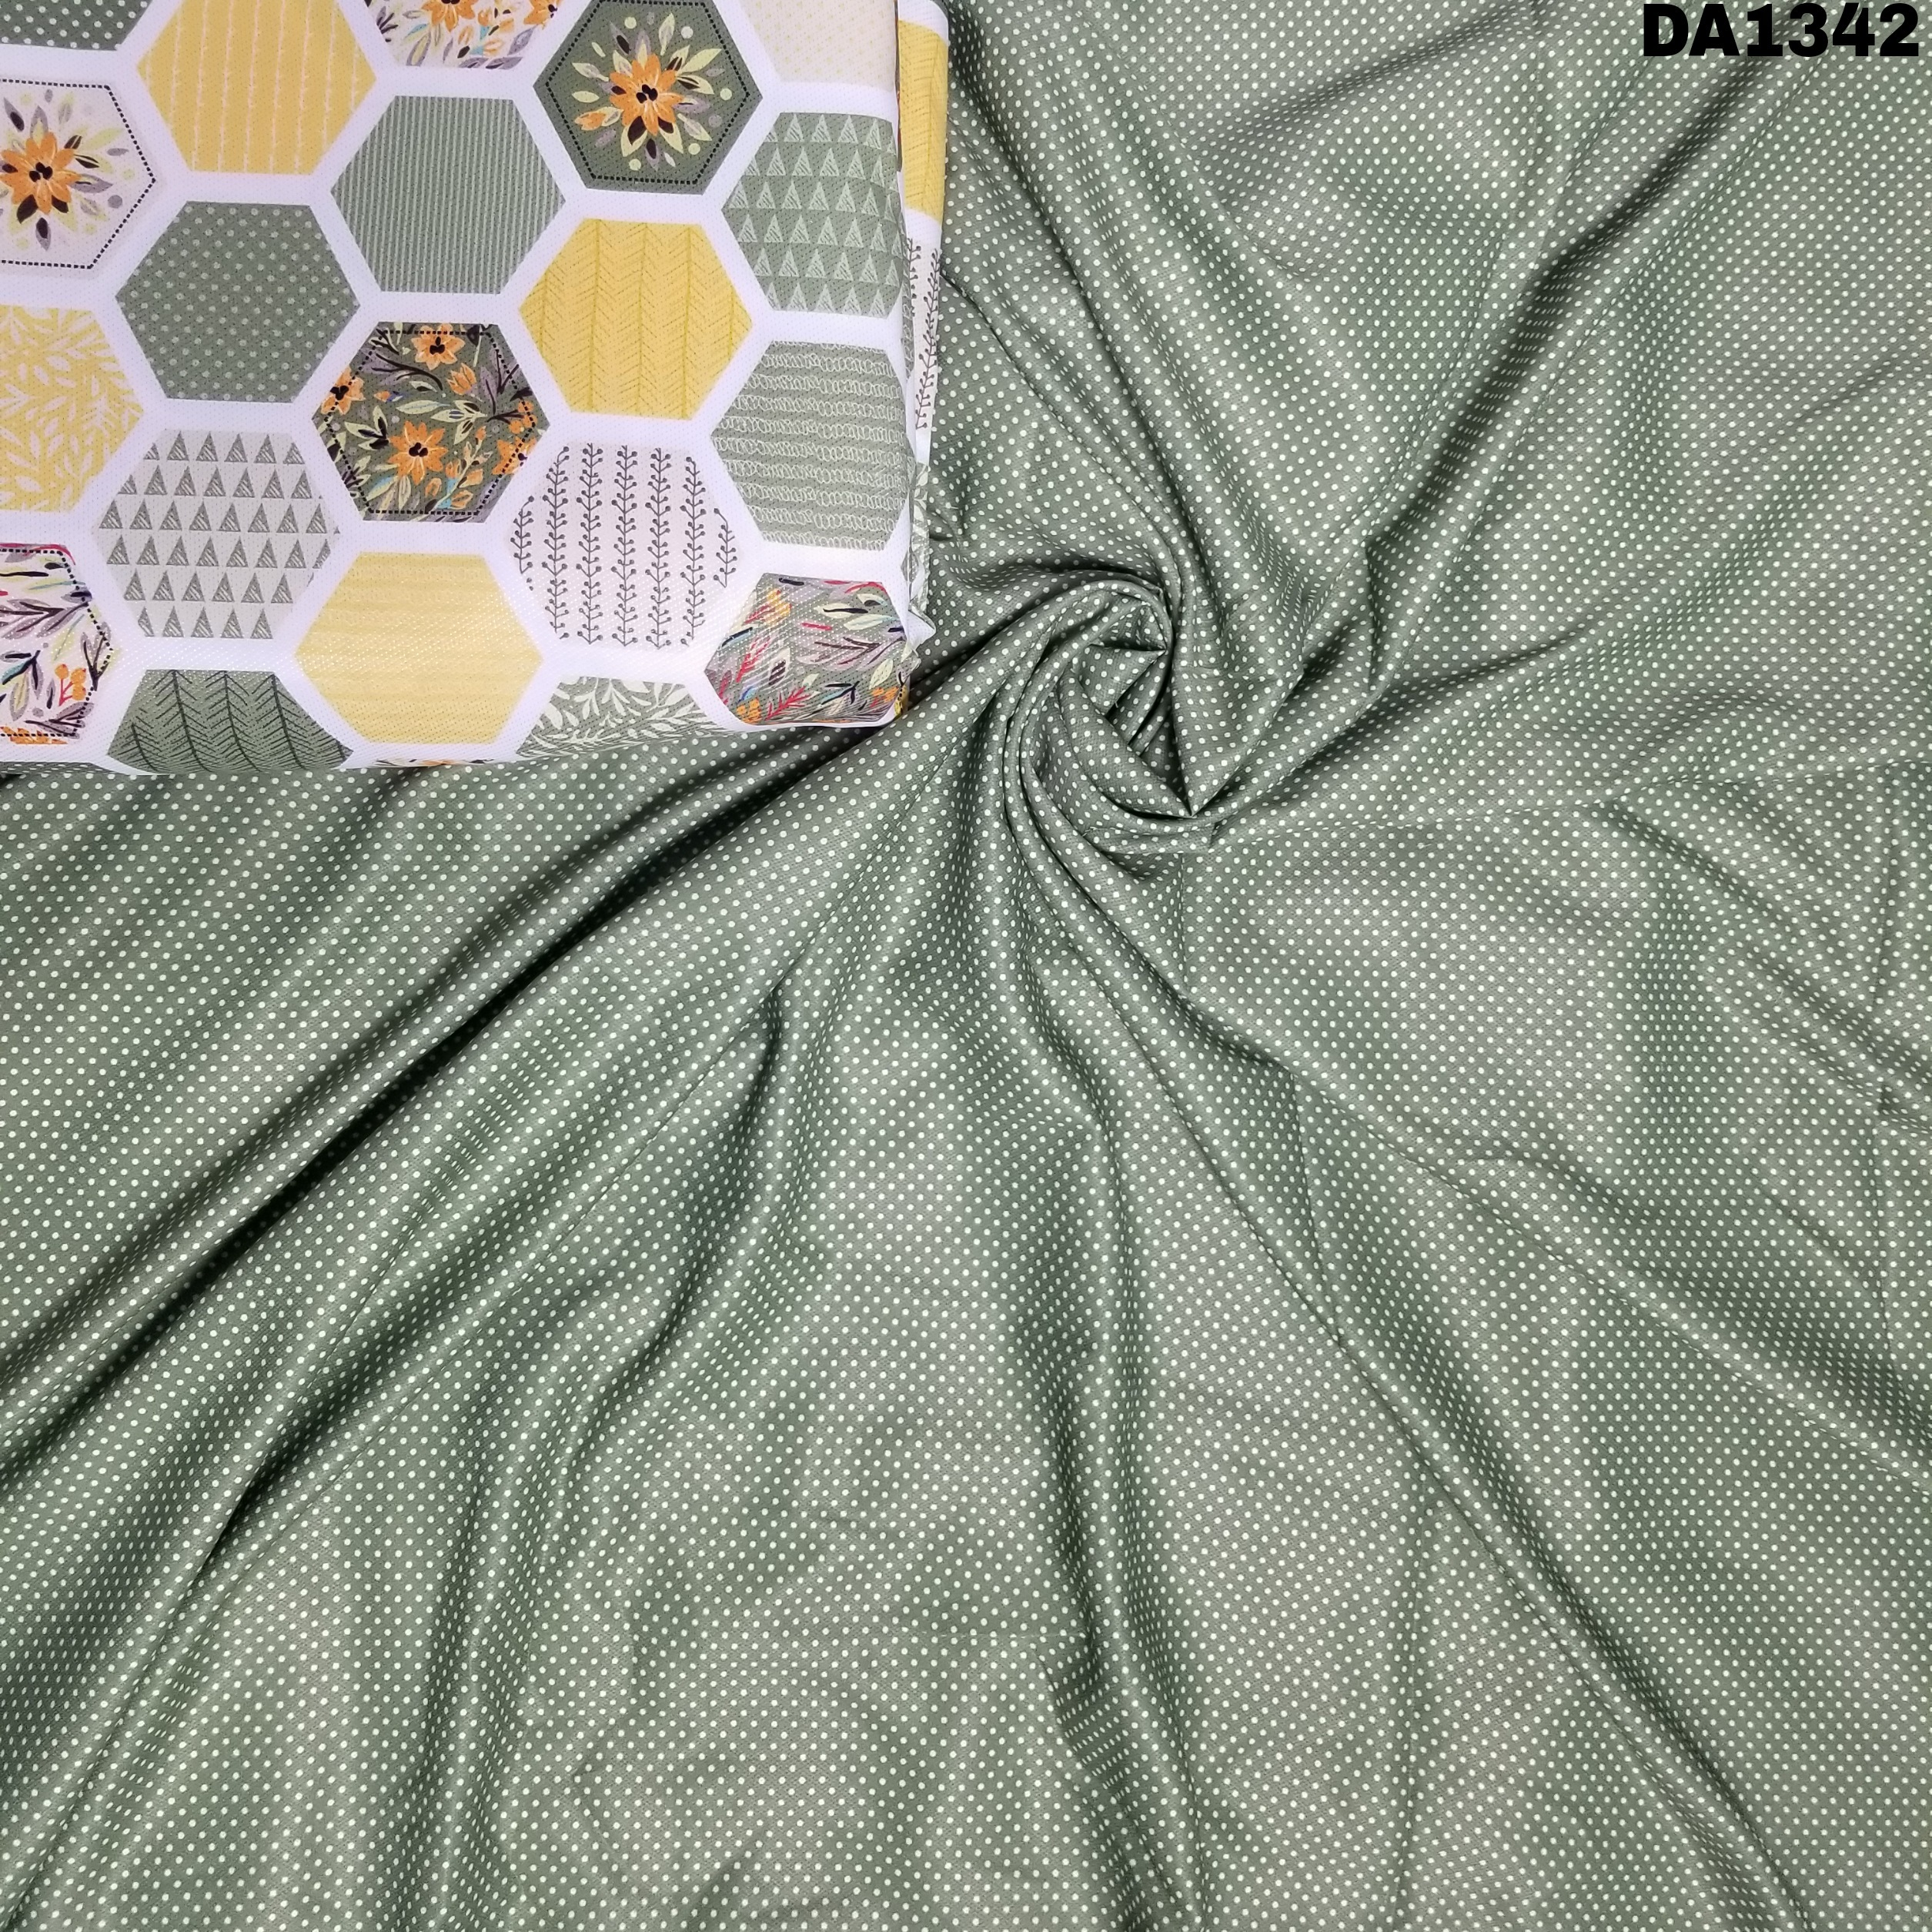 Football Digital Print Fabric